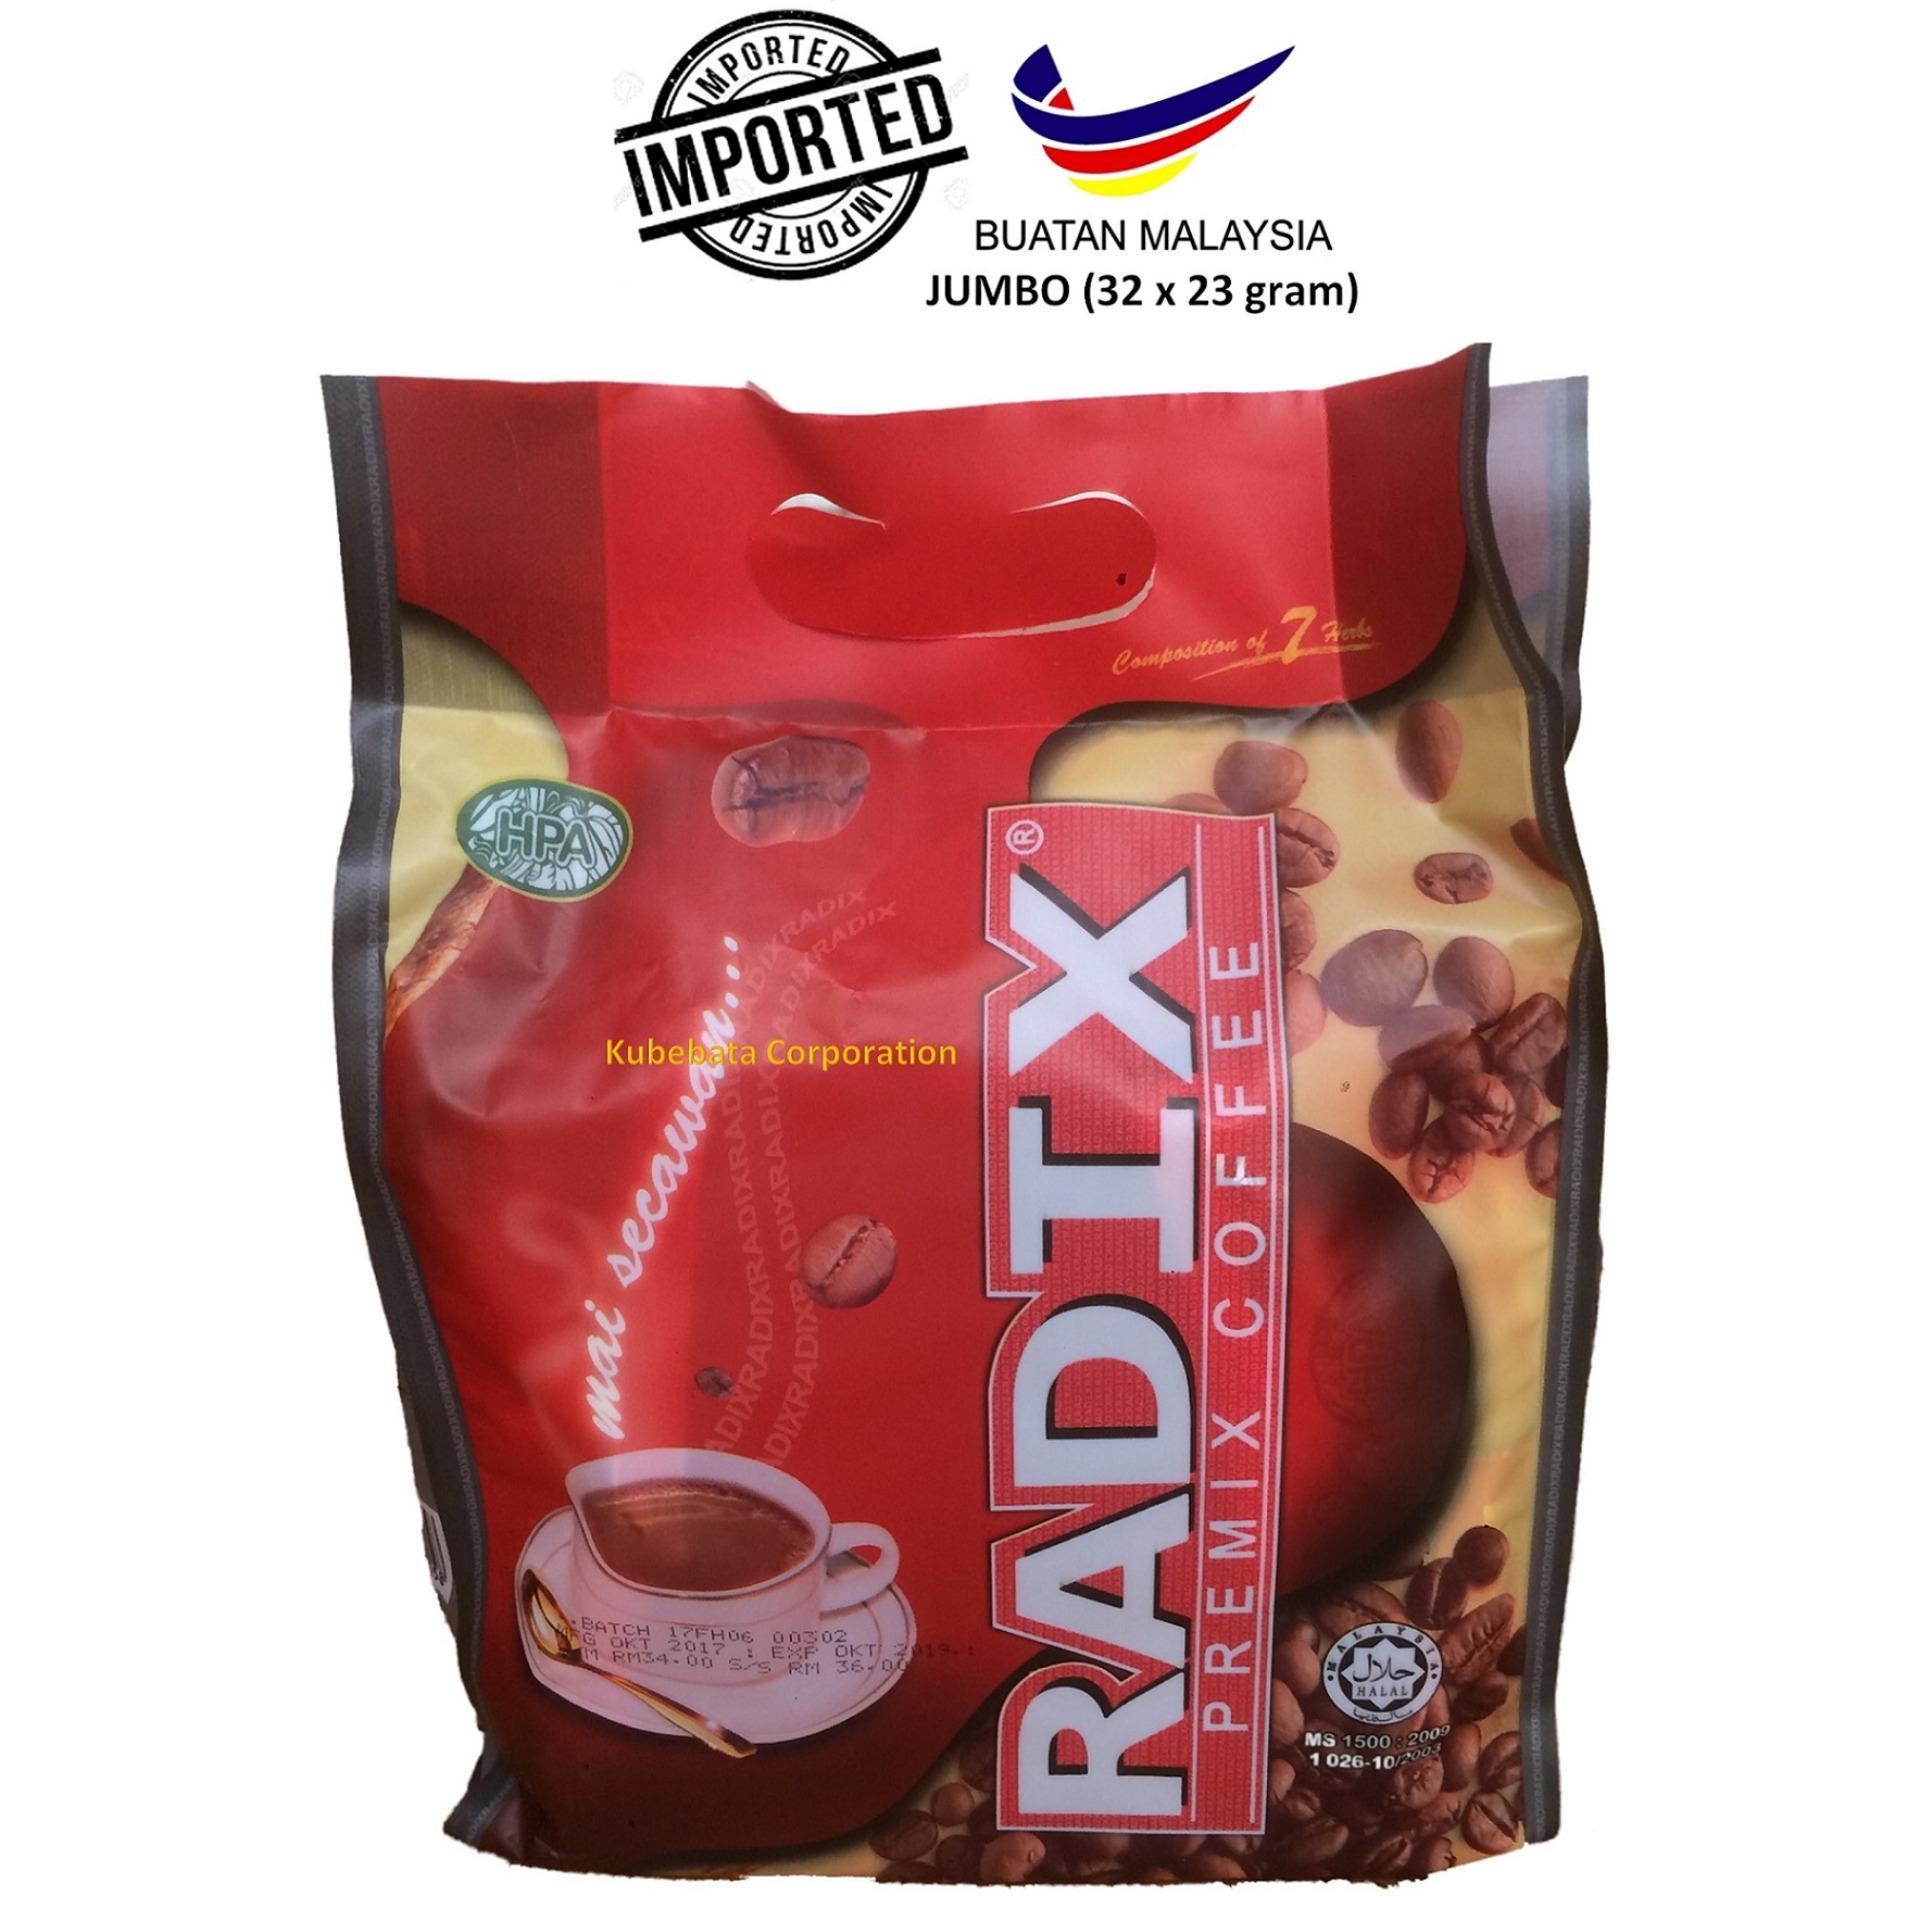 Kopi RADIX HPA IMPOR MALAYSIA (32 Sachets x 23 gram) ORIGINAL JUMBO per pouch